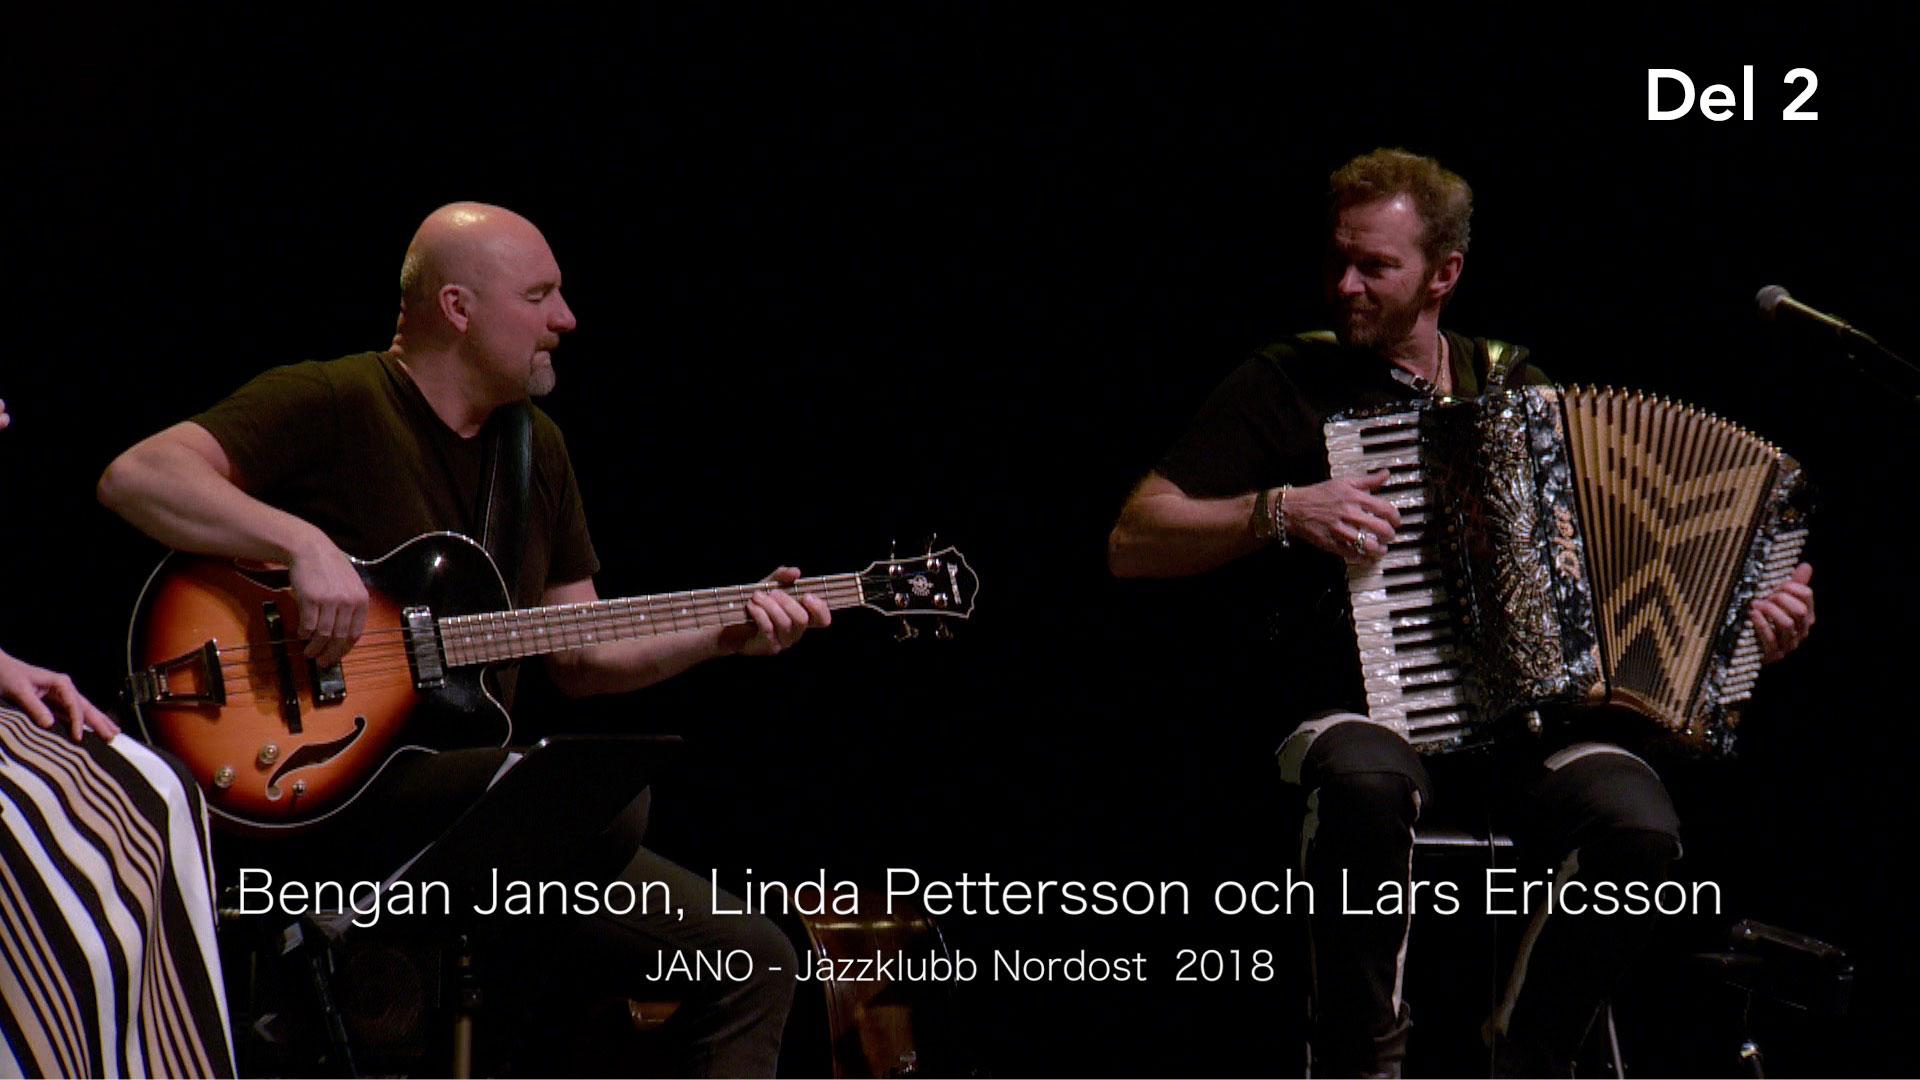 Bengan Jansson, Linda Pettersson och Lars Ericsson